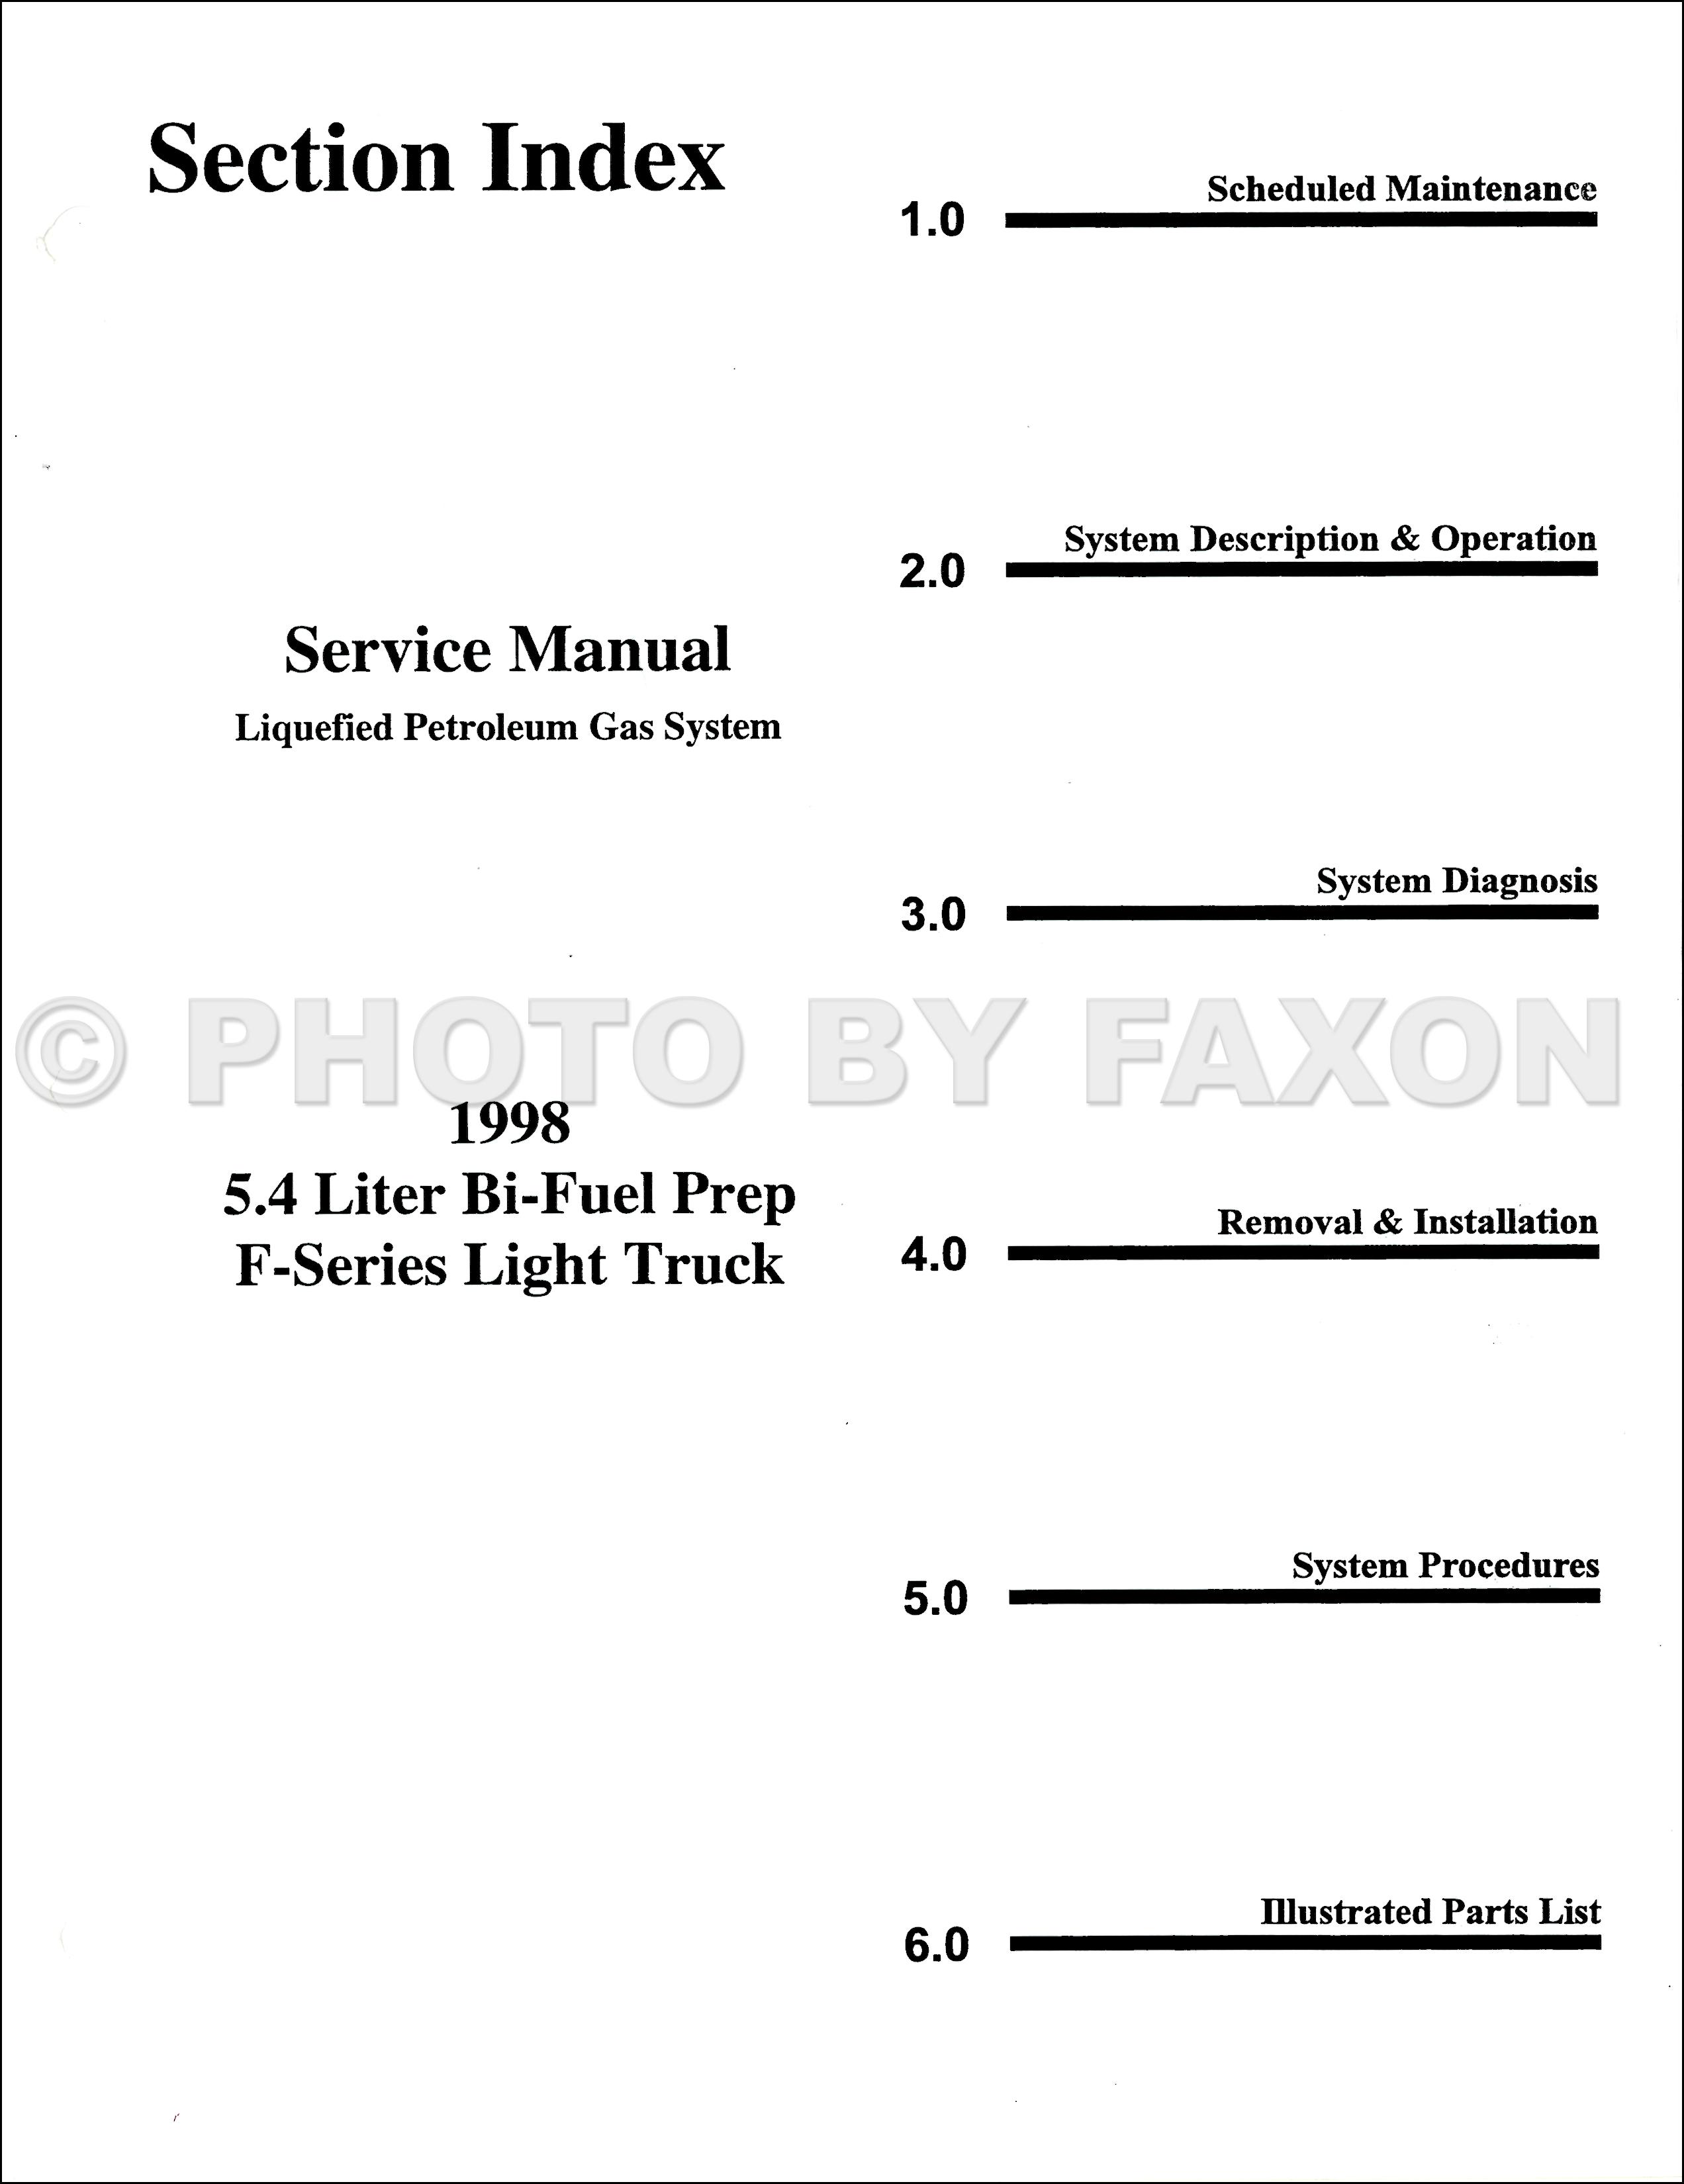 Lpg Wiring Diagram Ford 5 4 Liter Engine 1998 F150 F250 54l Bi Fuel